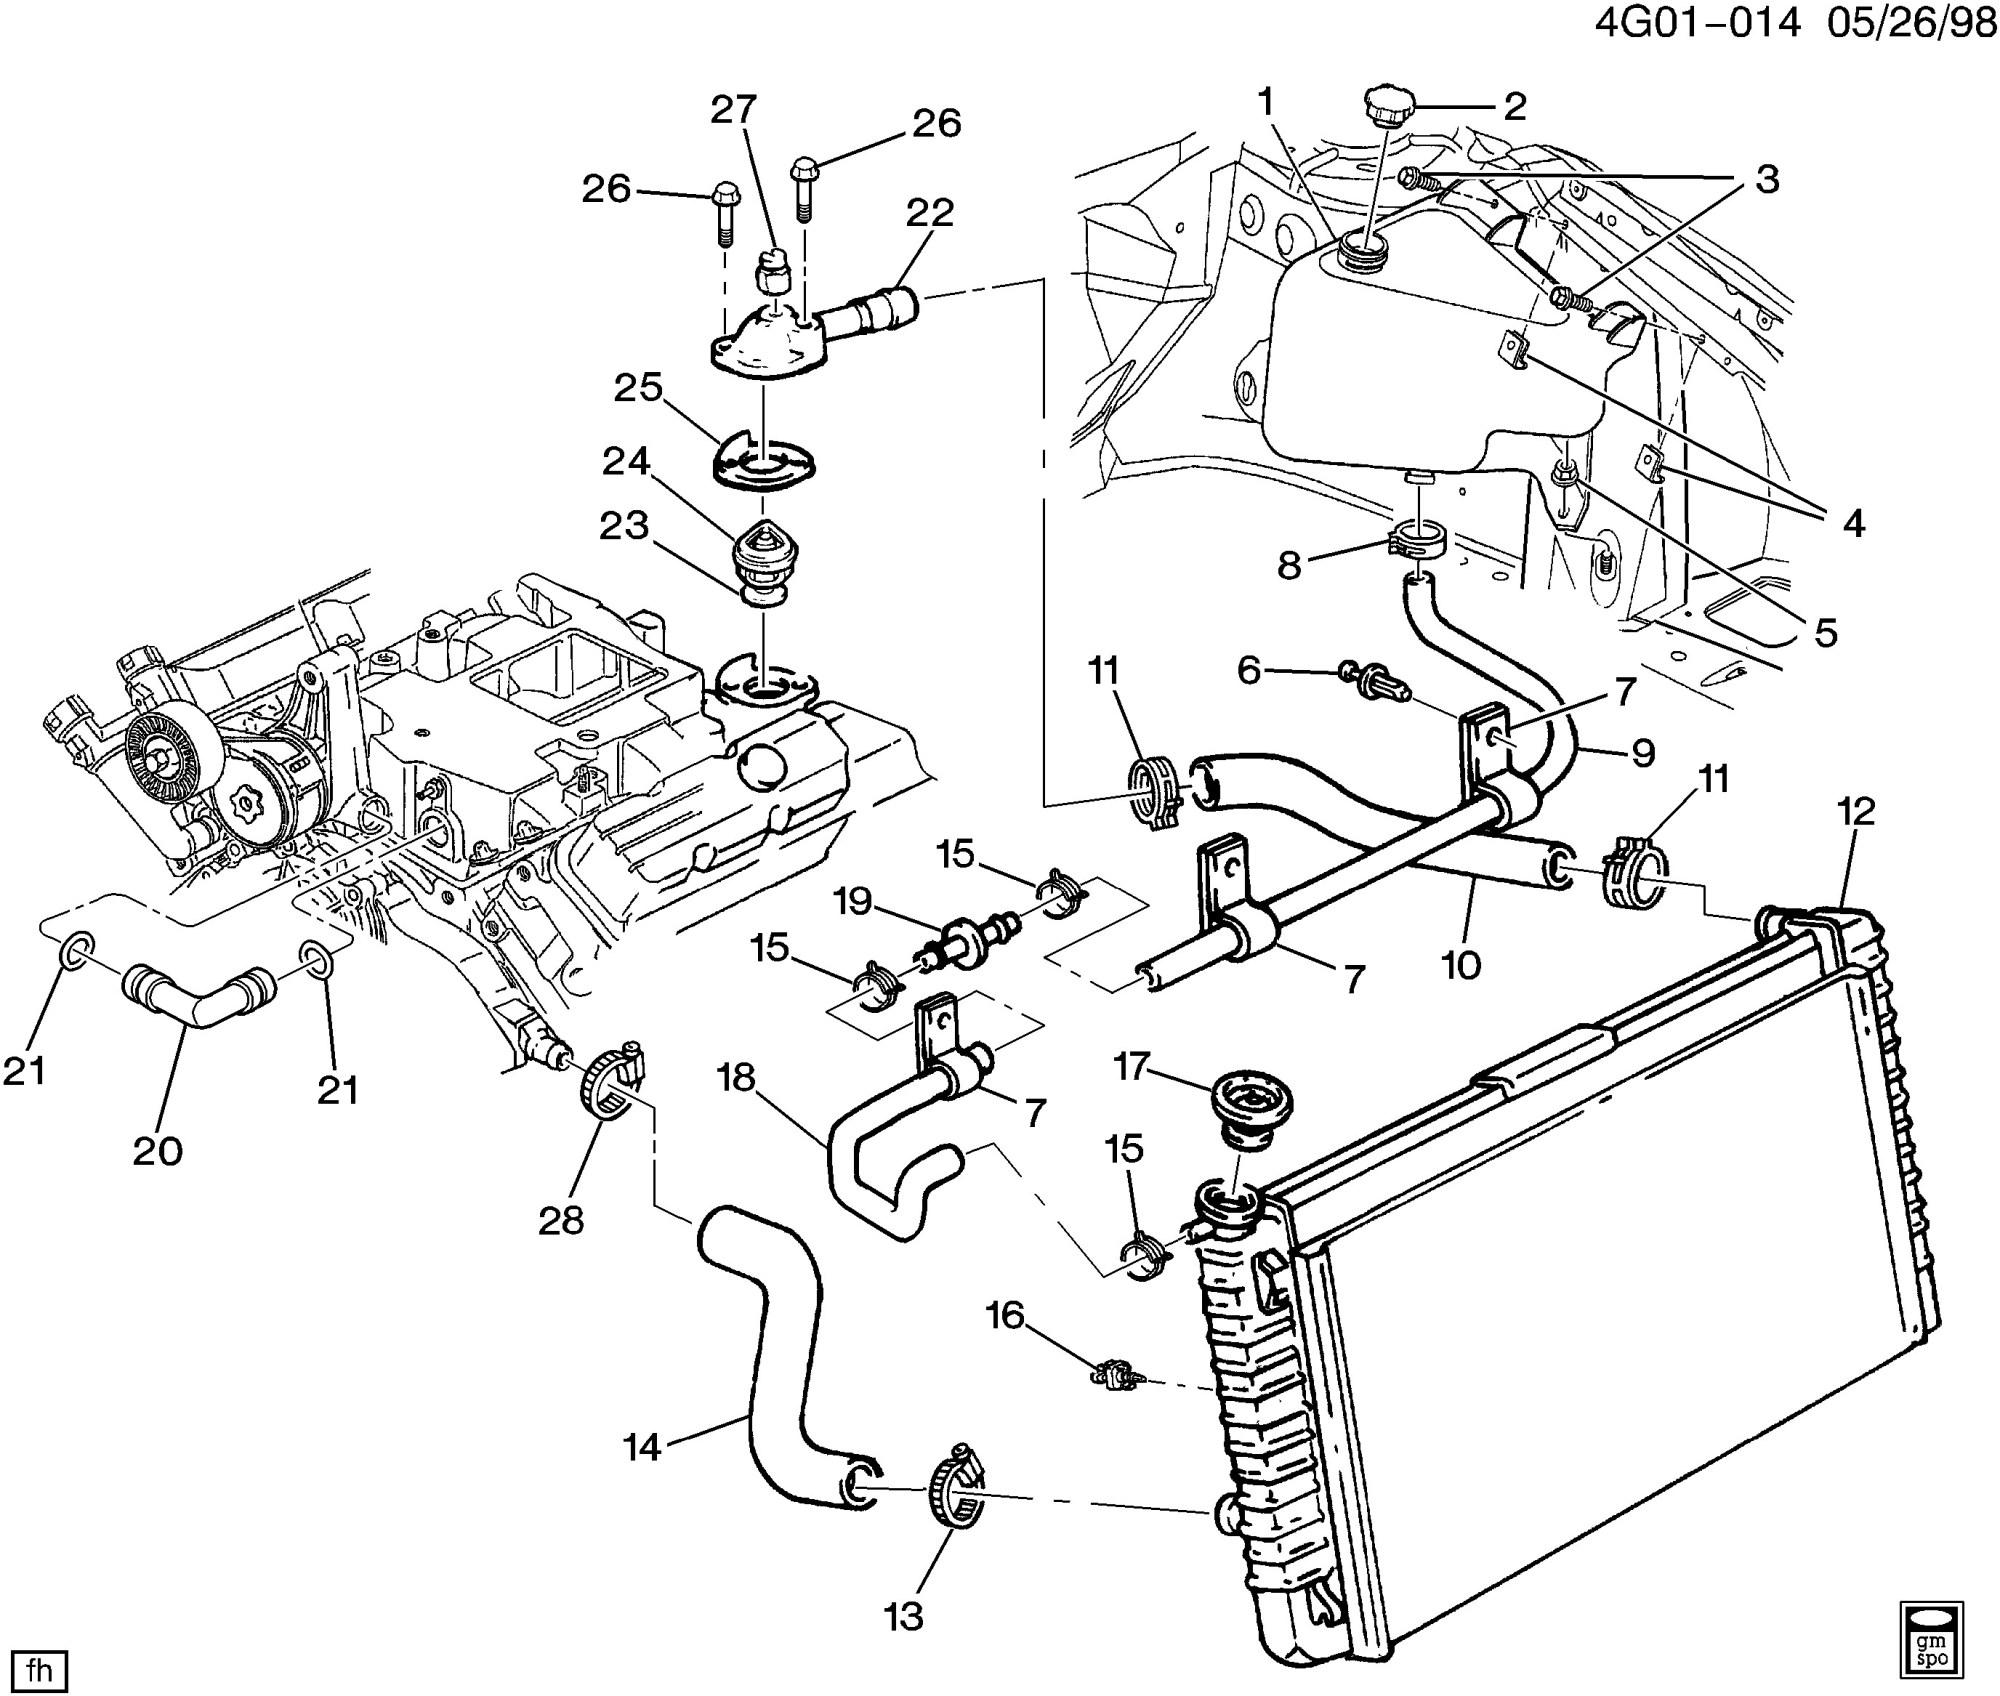 hight resolution of 3800 v6 engine diagram fiero th440 4t60 automatic transmission rh 5 pgserver de olds 3800 v6 engine diagram olds 3800 v6 engine diagram